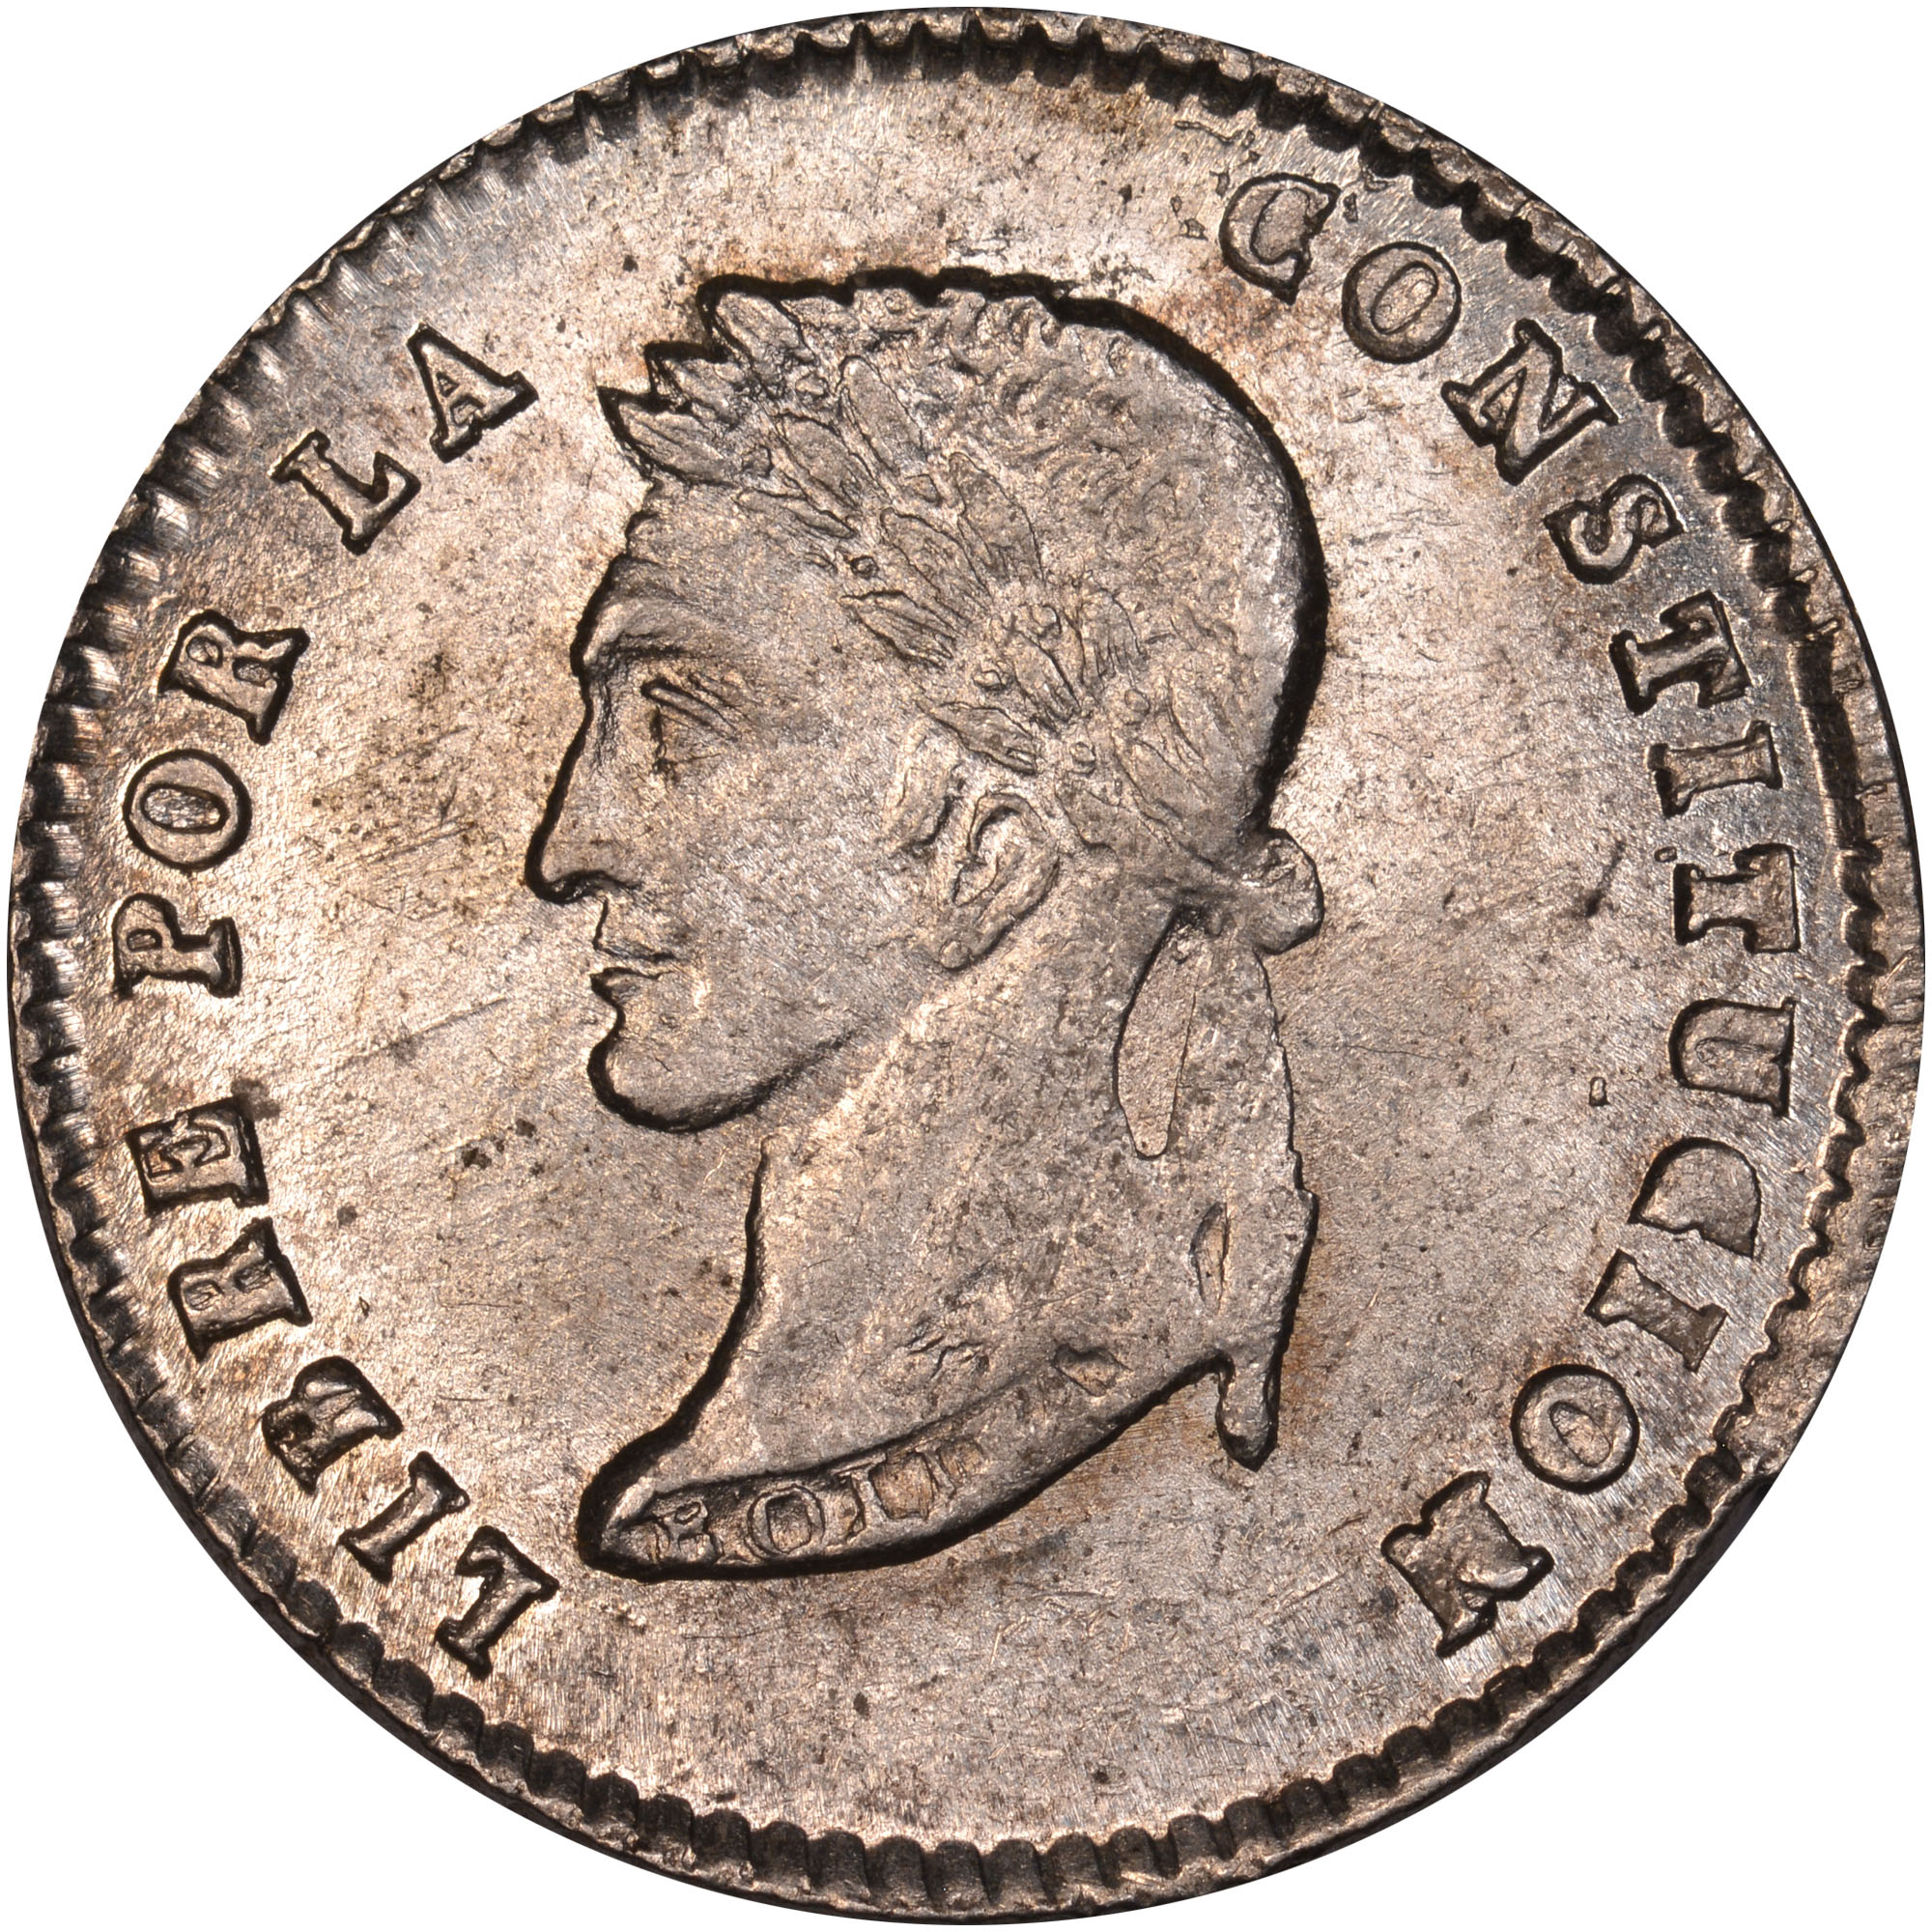 1855-1858/7 Bolivia Sol reverse